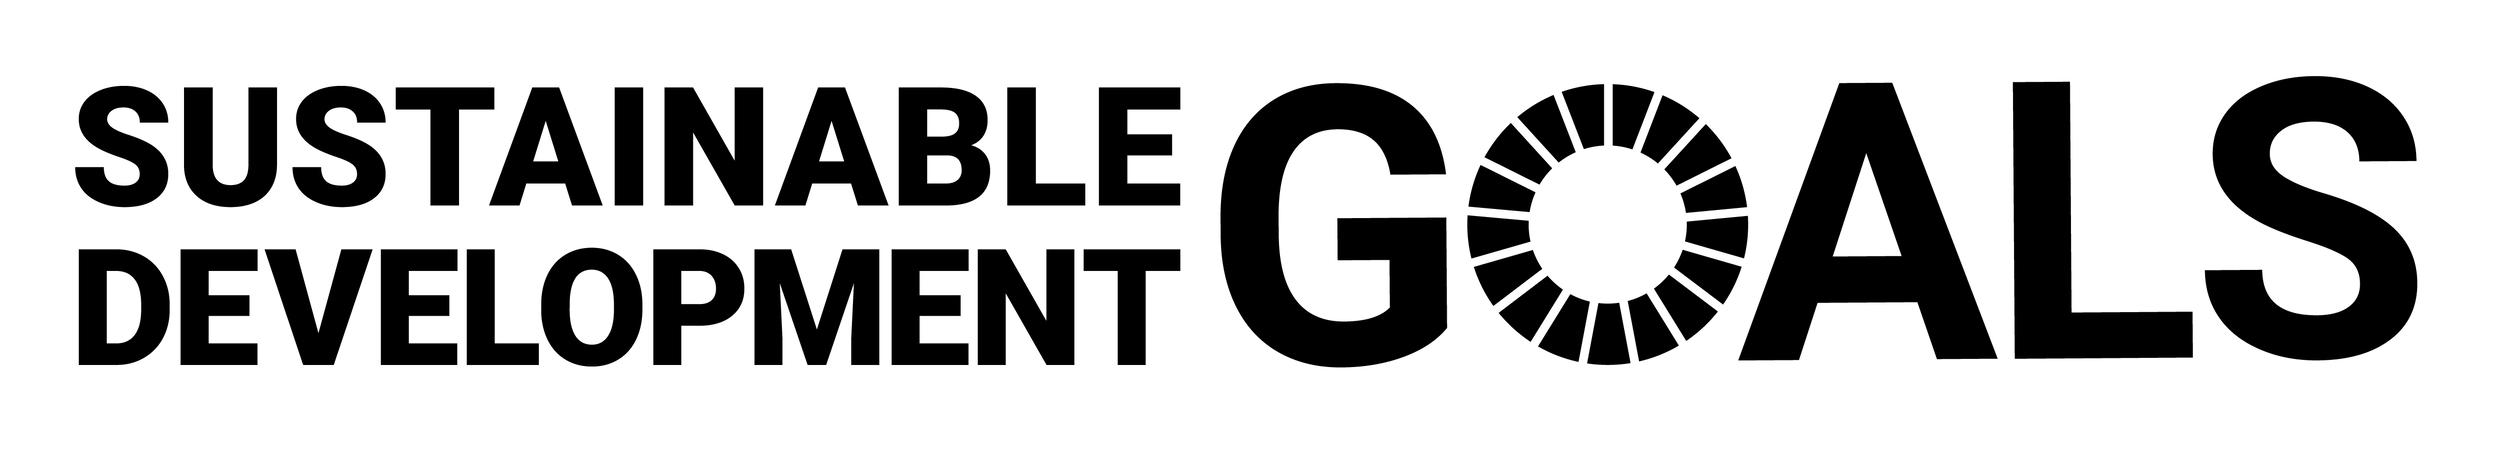 E_SDG_logo_without_UN_emblem_horizontal_black_RBG.png